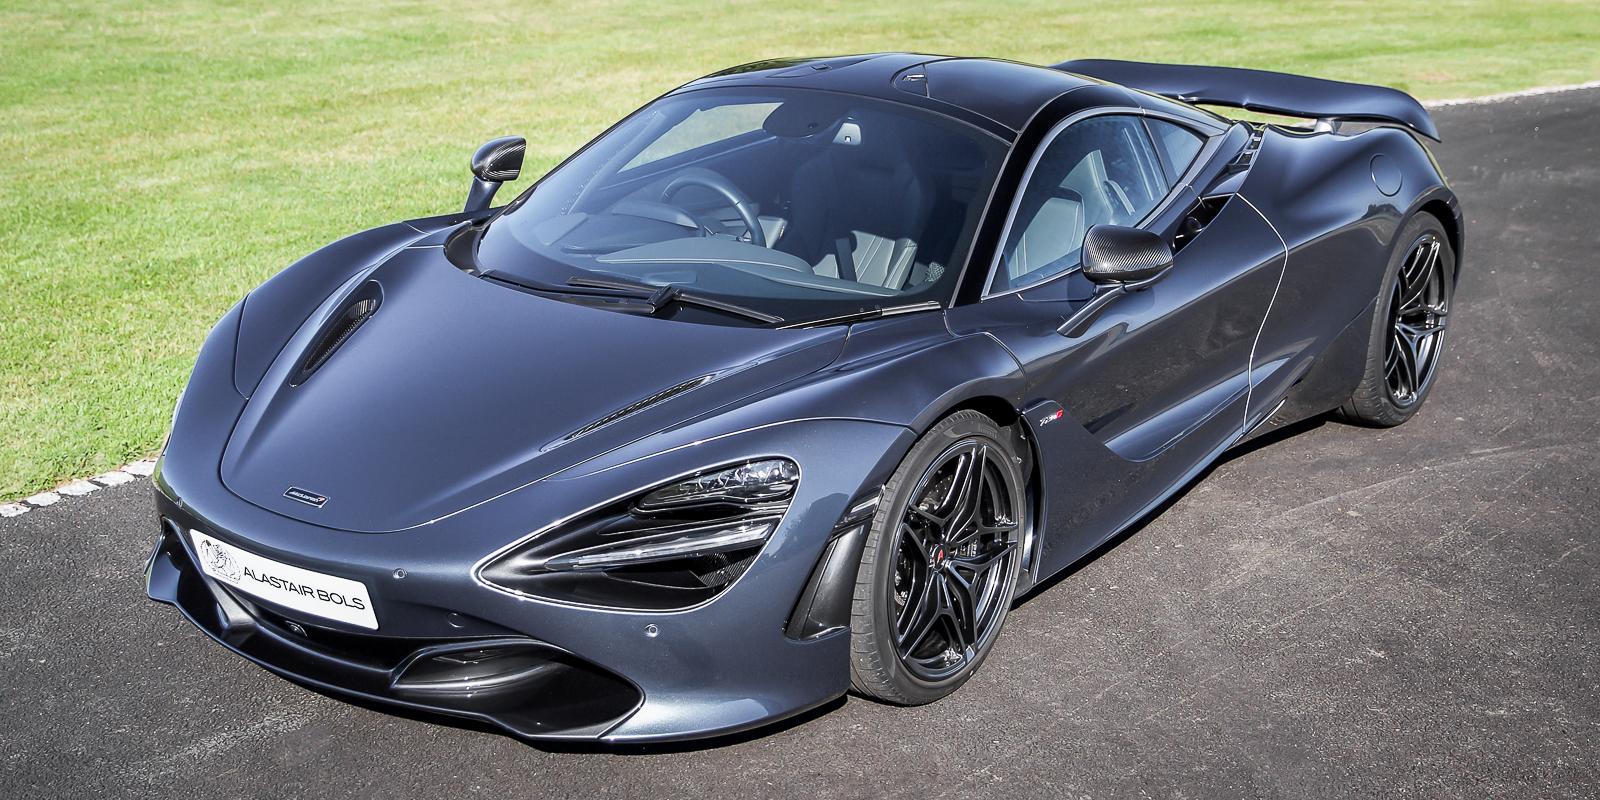 McLaren 720S Luxury Saros